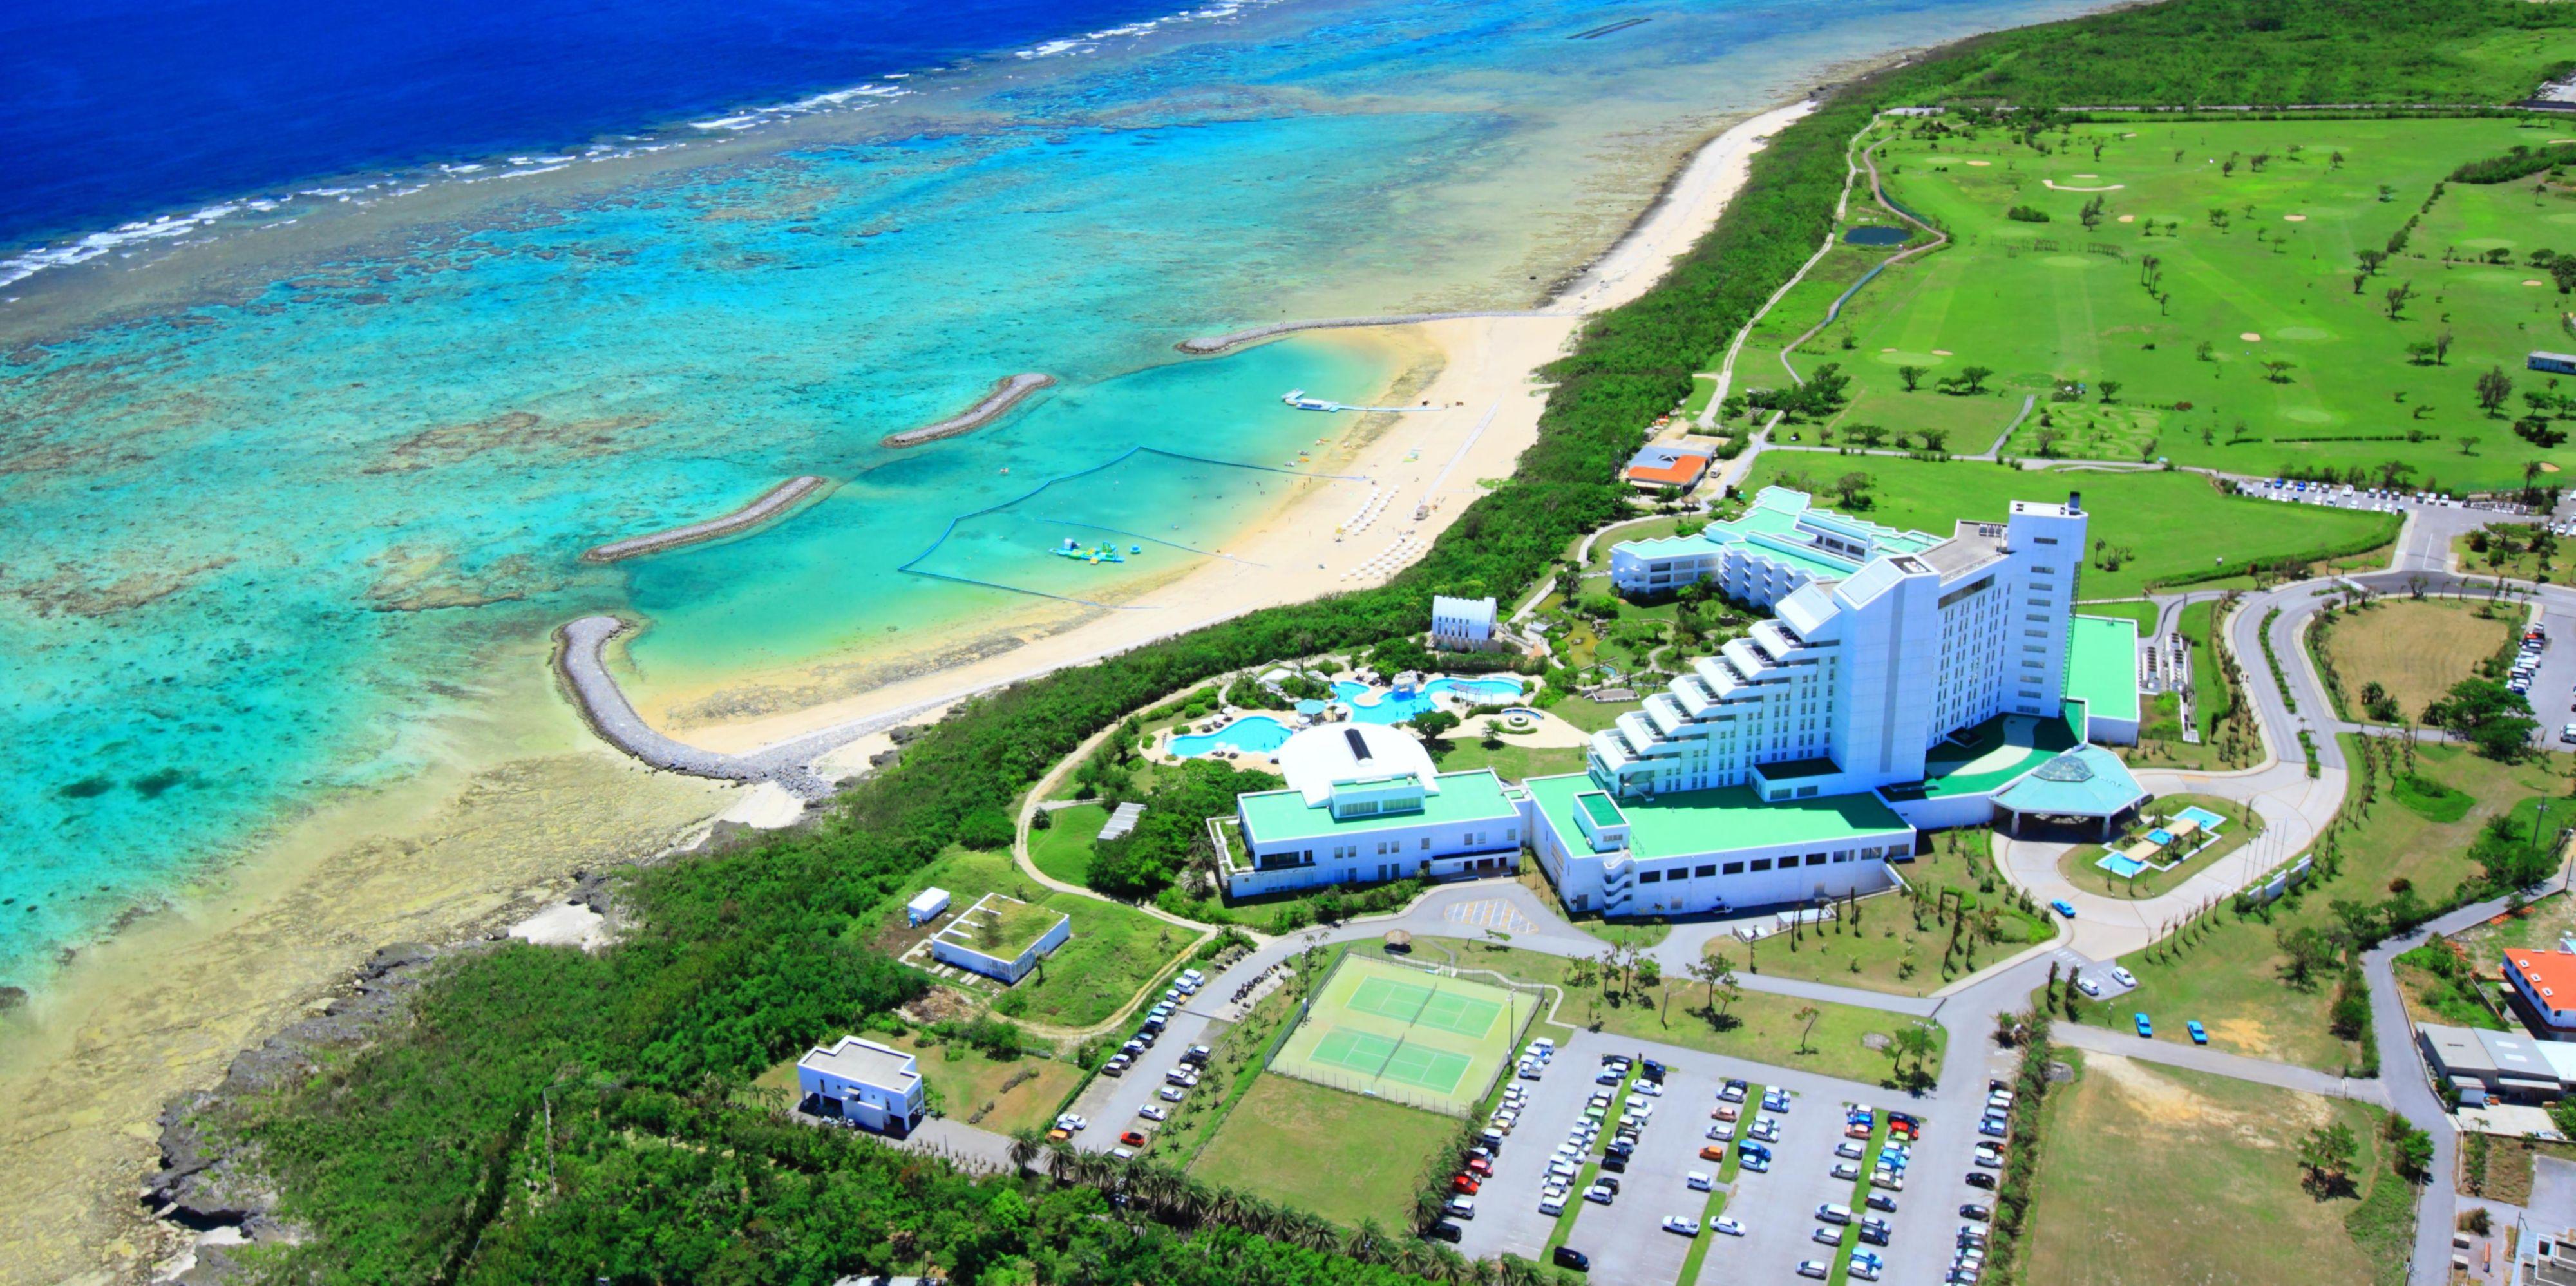 Okinawa Hotels InterContinental ANA Ishigaki Resort Hotel in